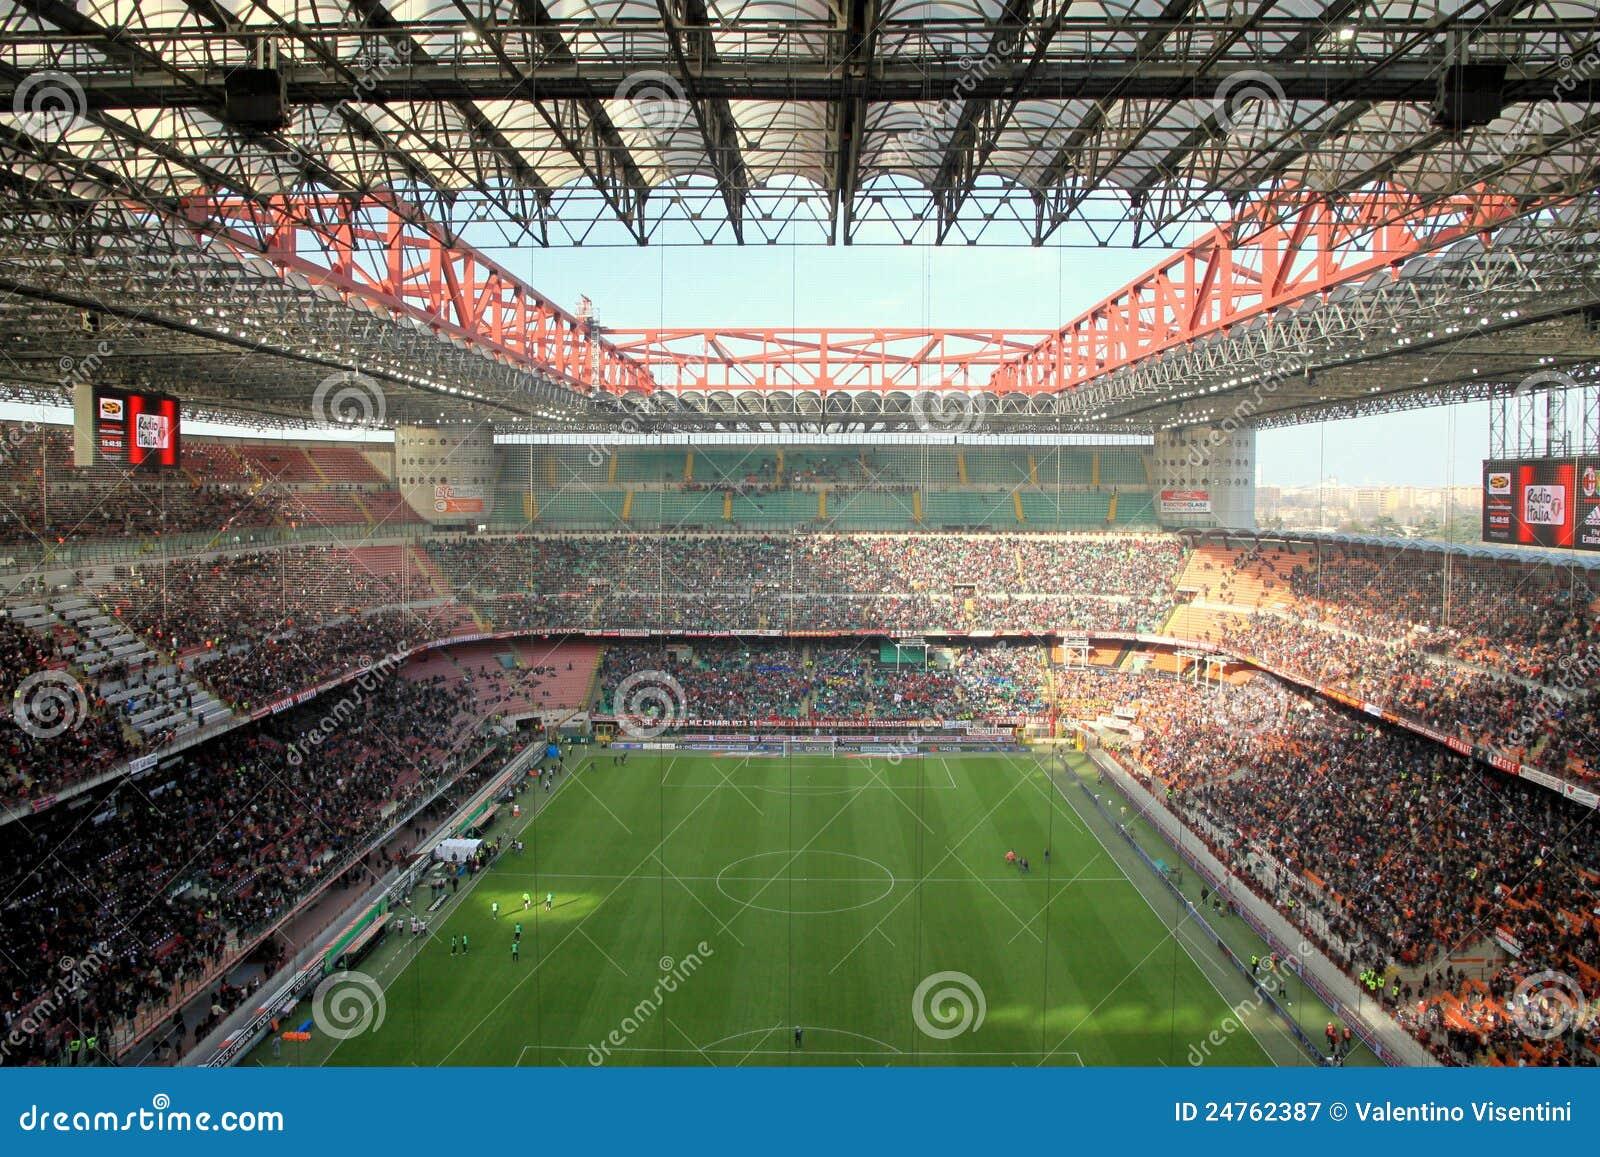 san siro stadium editorial photography image 24762387